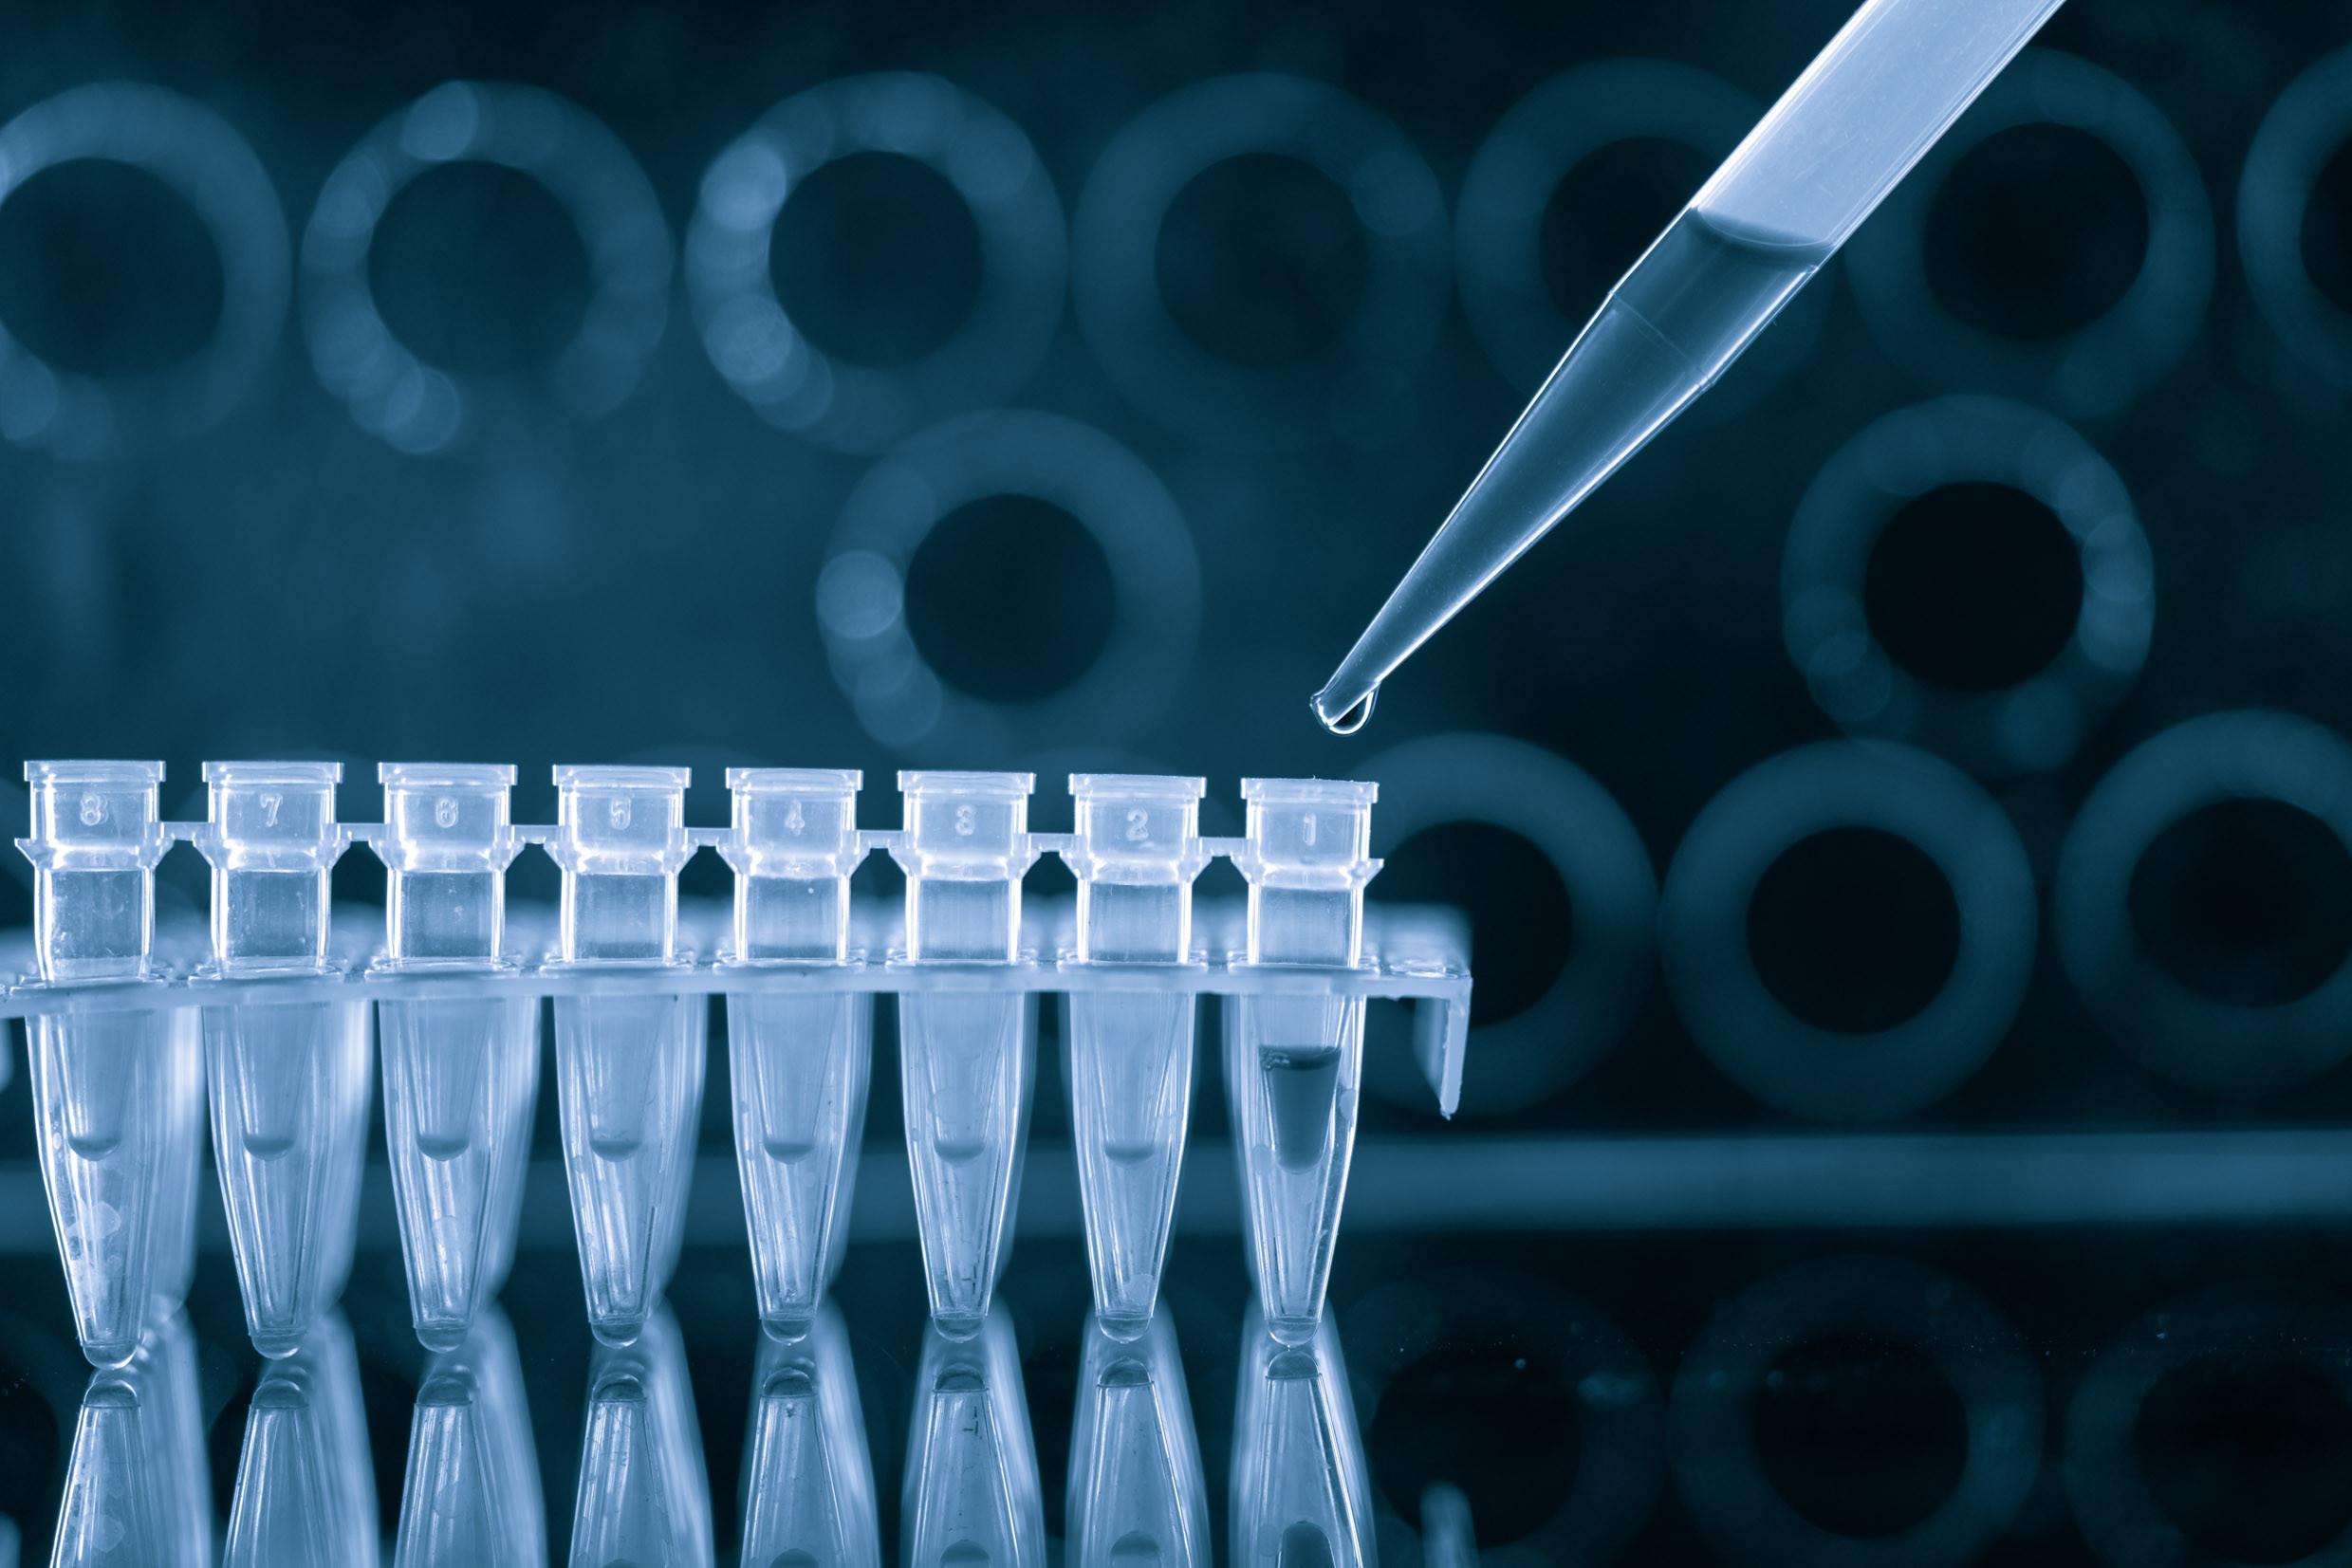 SAME DAY PCR SURVEILLANCE TESTING